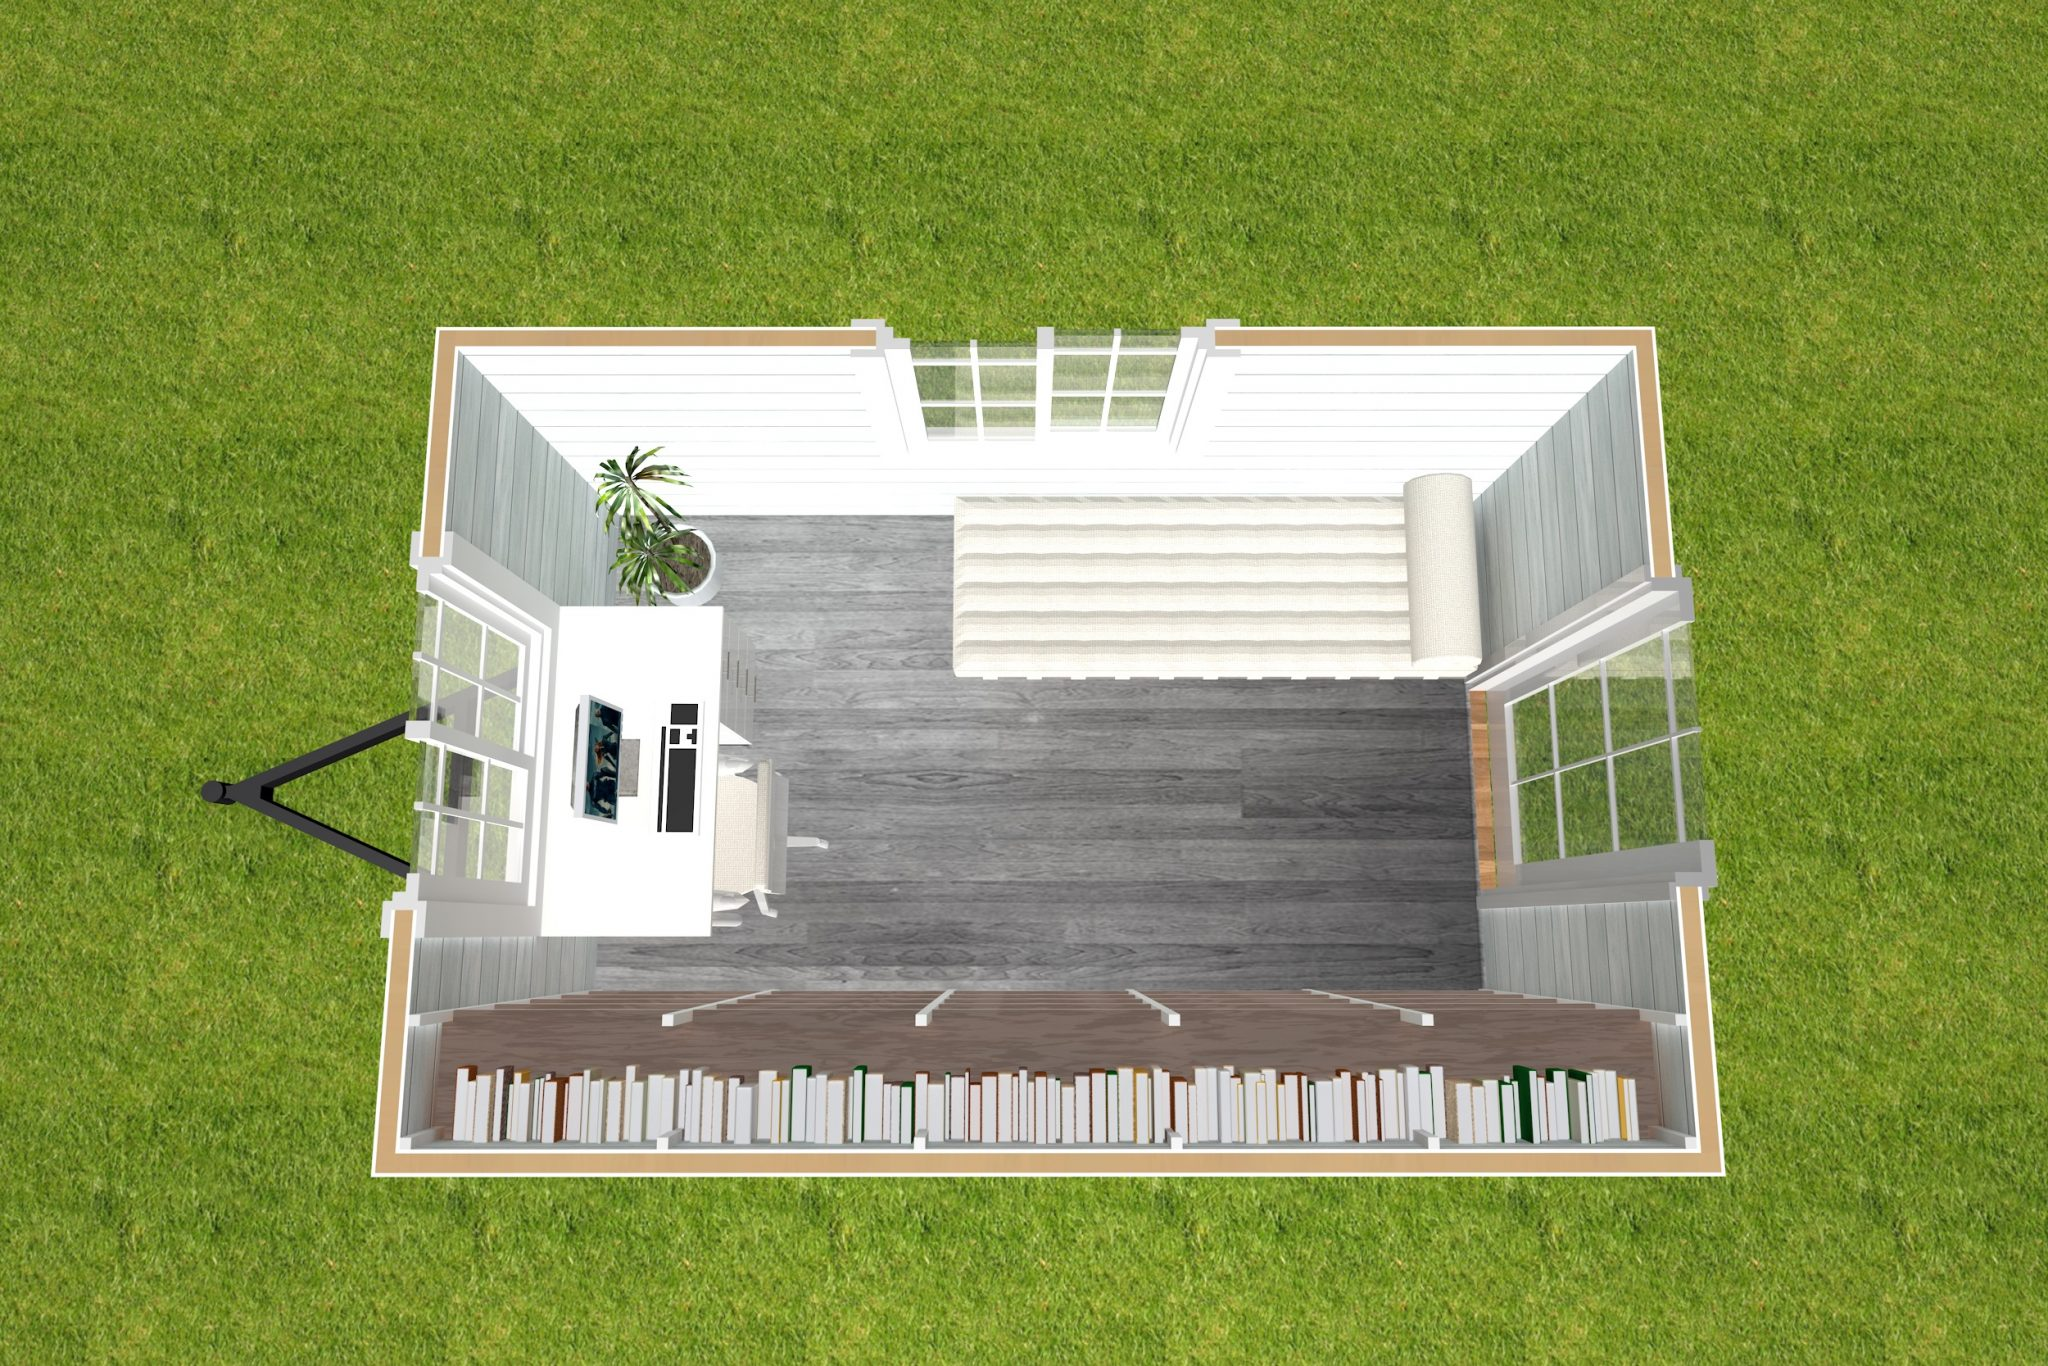 4 Studio Series - 3600 Interior View